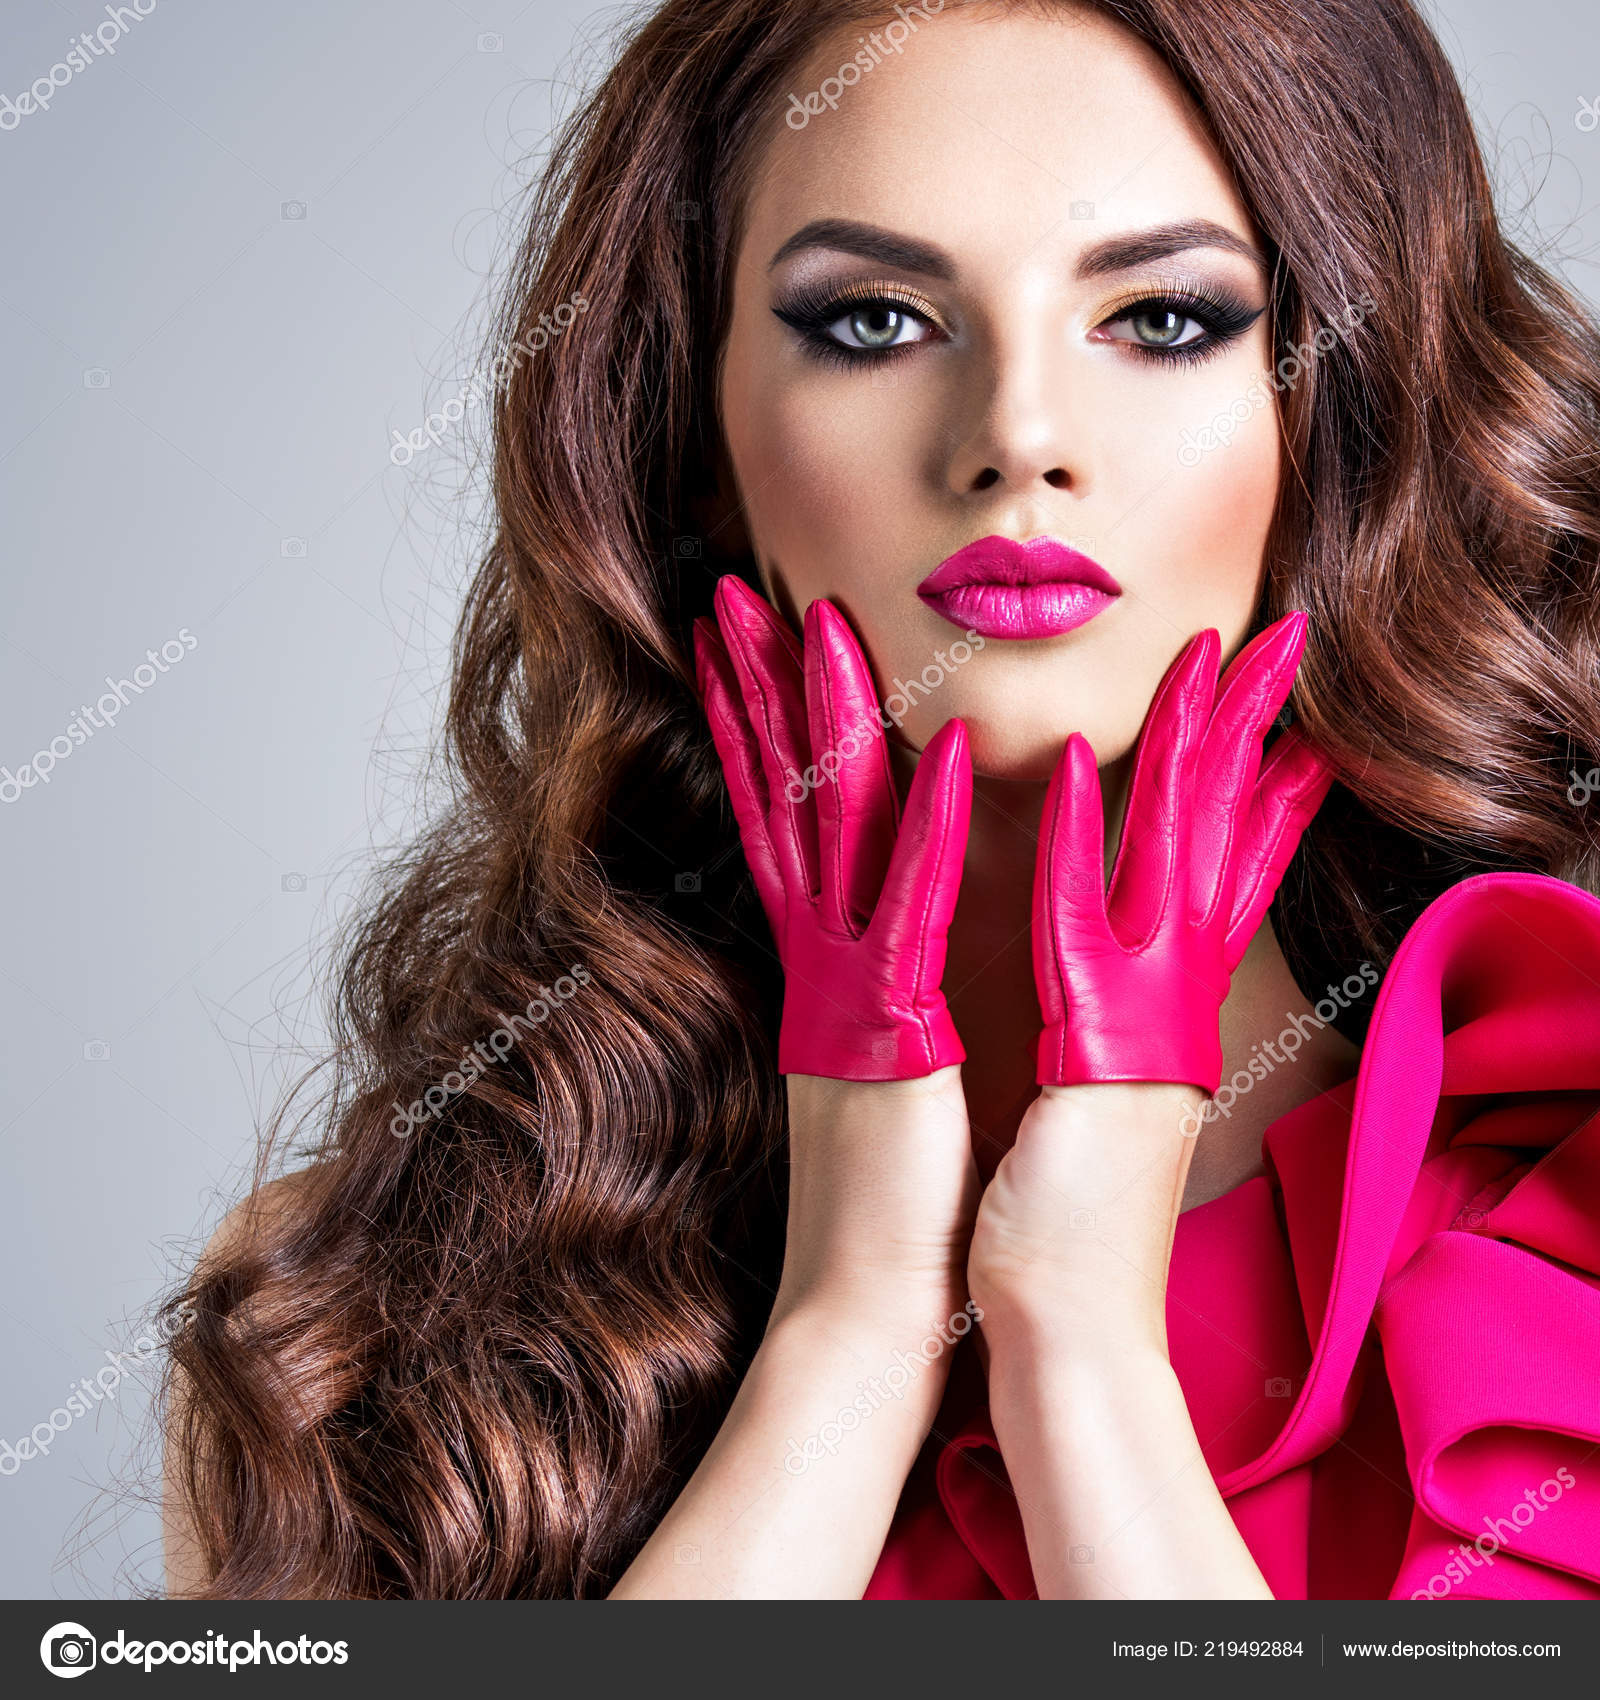 cfd5ab9afd42 Μοντέρνα Γυναίκα Ένα Κόκκινο Φόρεμα Ένα Δημιουργικό Μάτι Μακιγιάζ Closeup — Φωτογραφία  Αρχείου